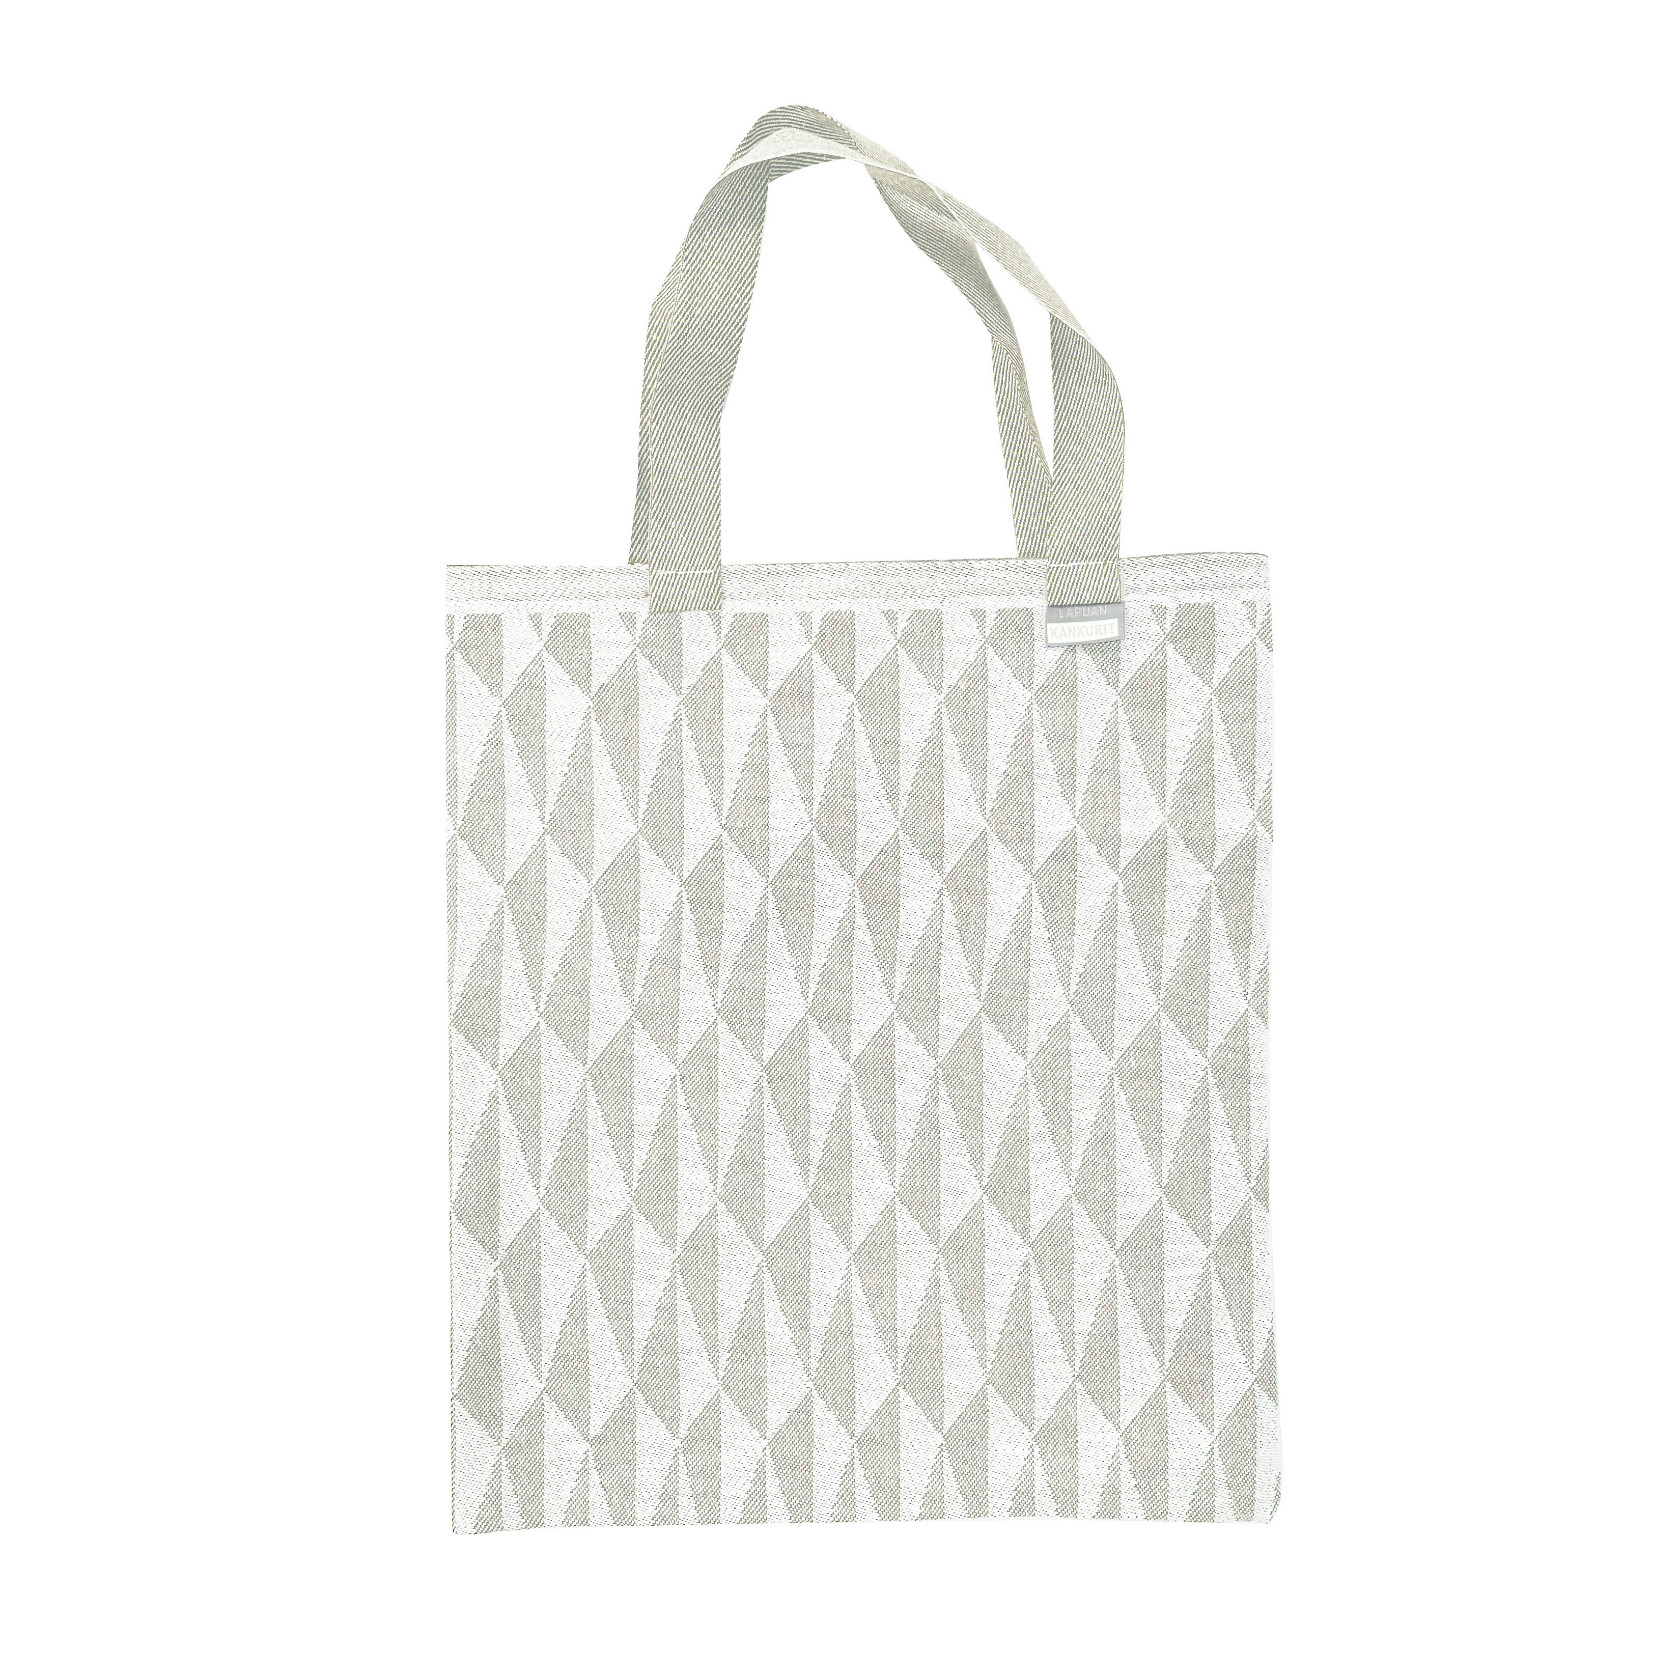 TRIANO bag(LAPUAN KANKURIT ラプアンカンクリ)